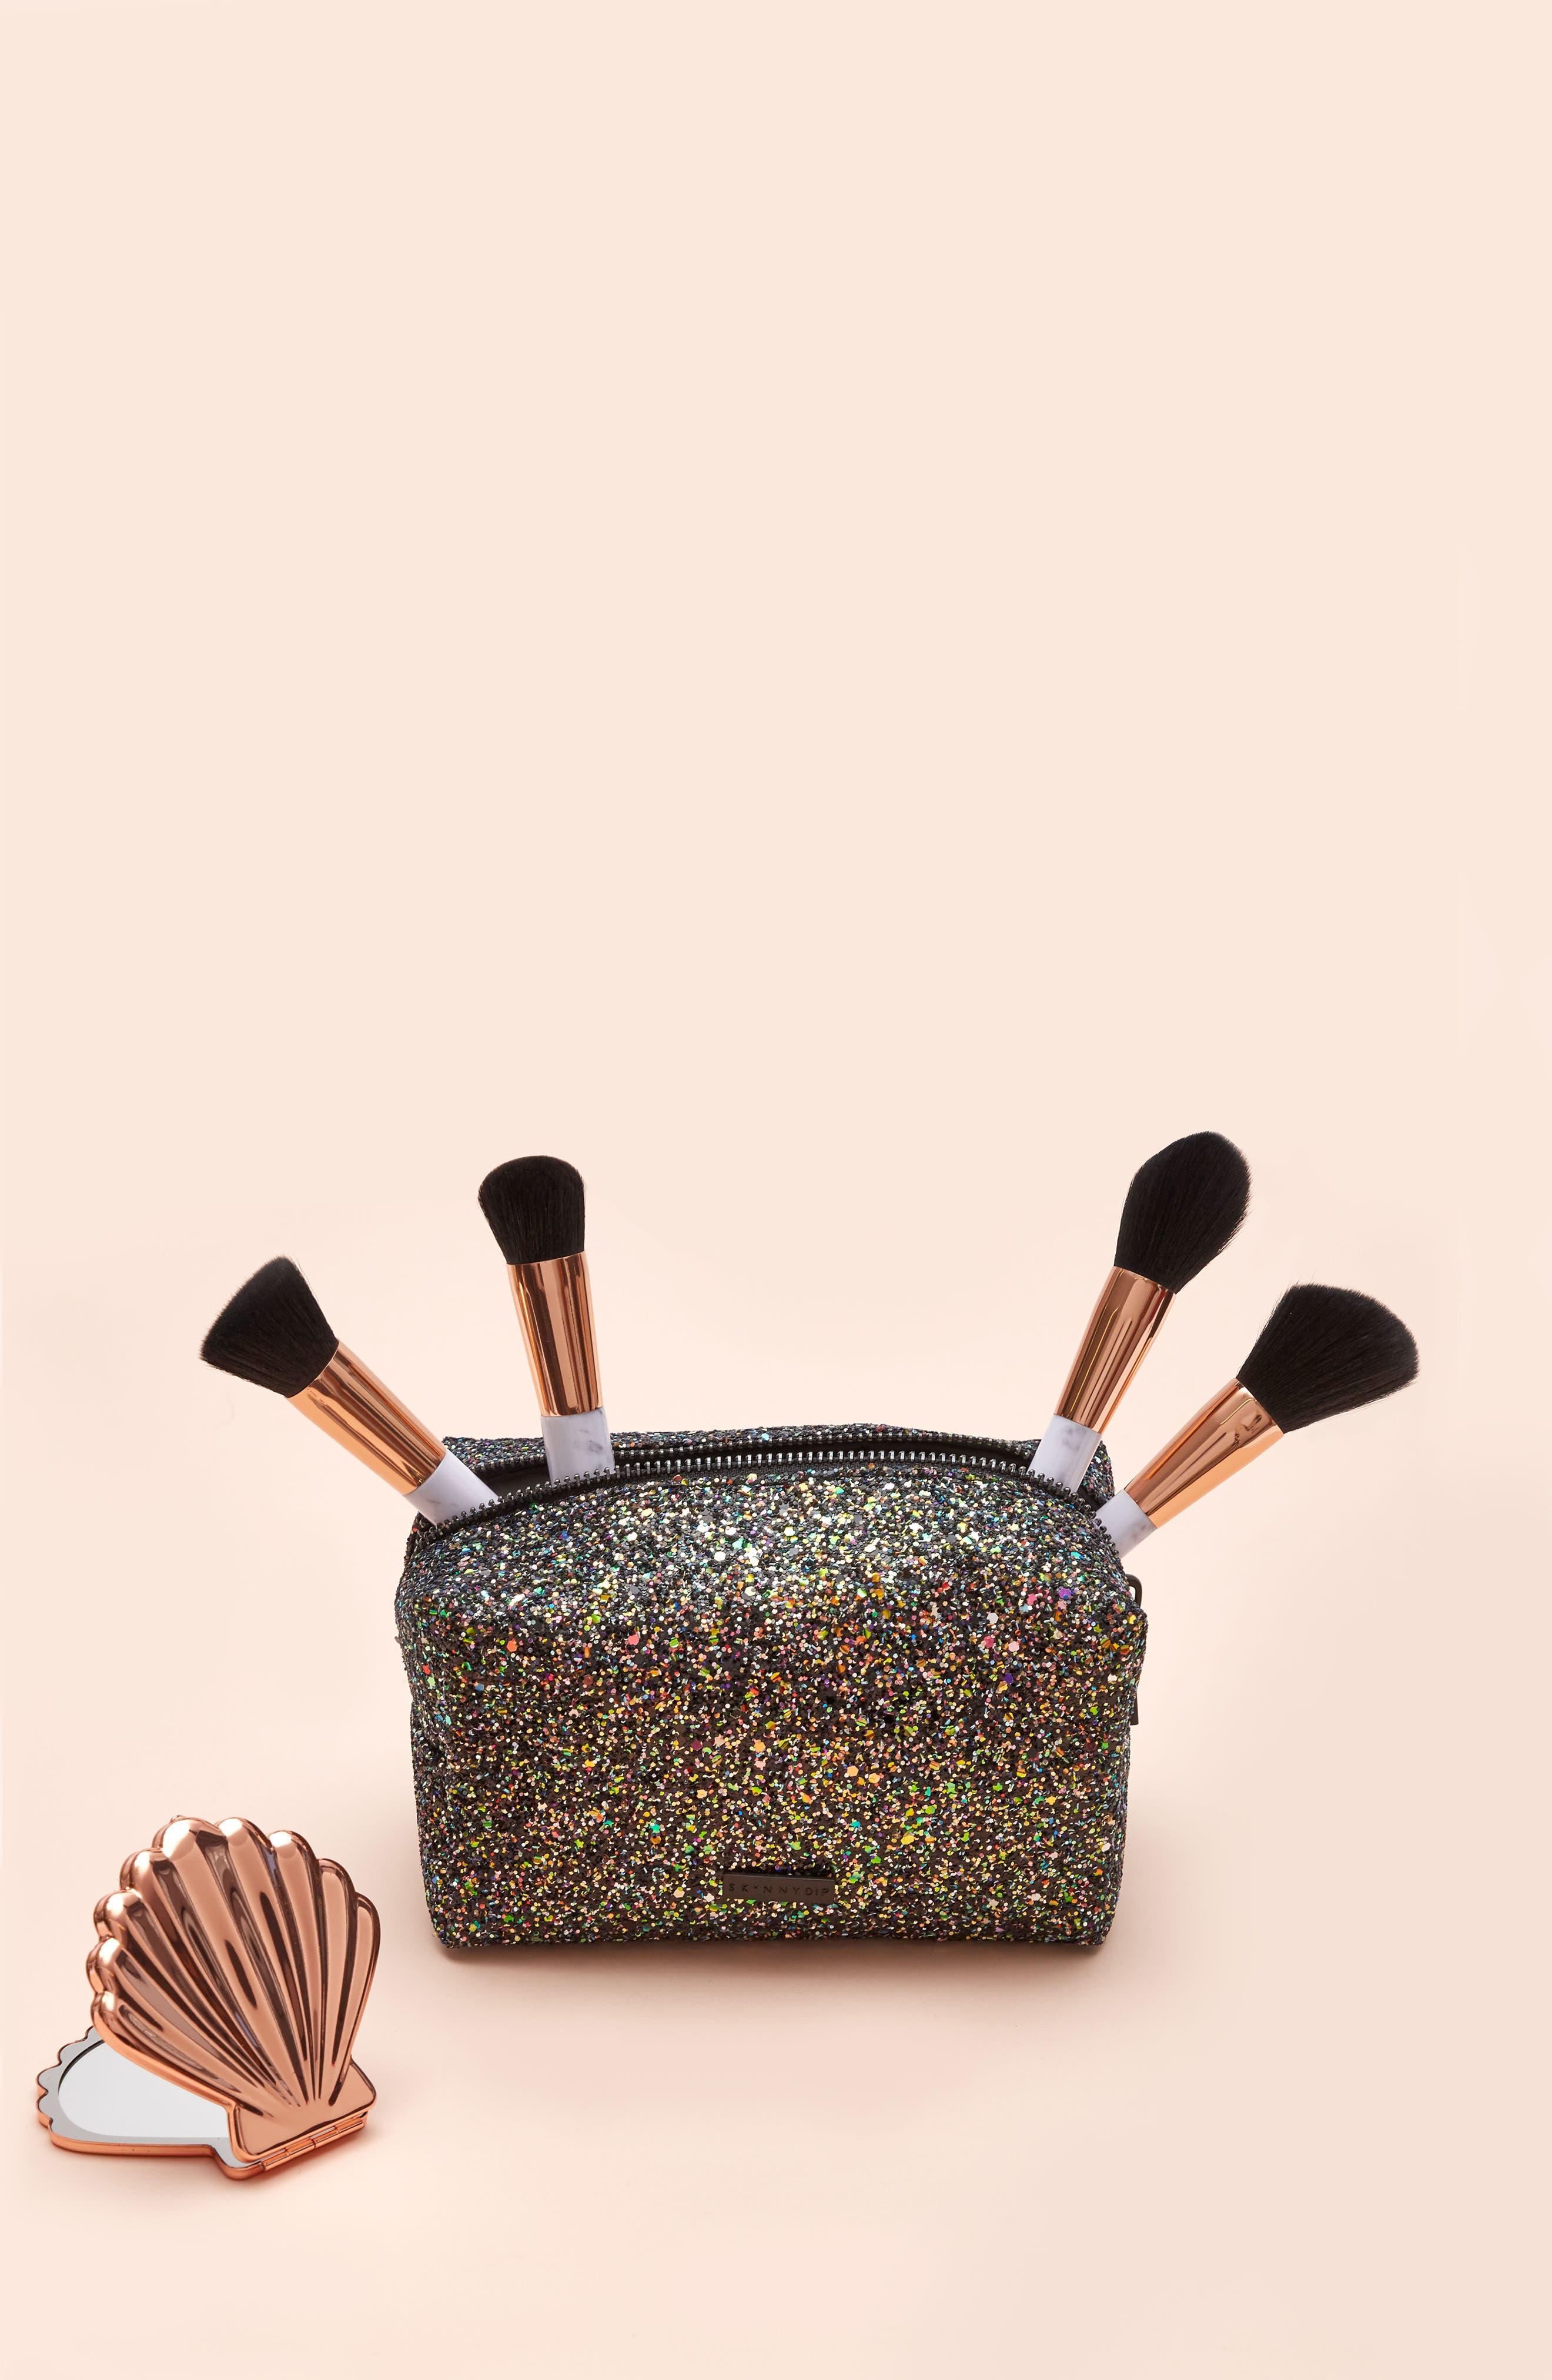 Skinny Dip Liquorice Glitter Cosmetics Bag,                             Alternate thumbnail 6, color,                             000